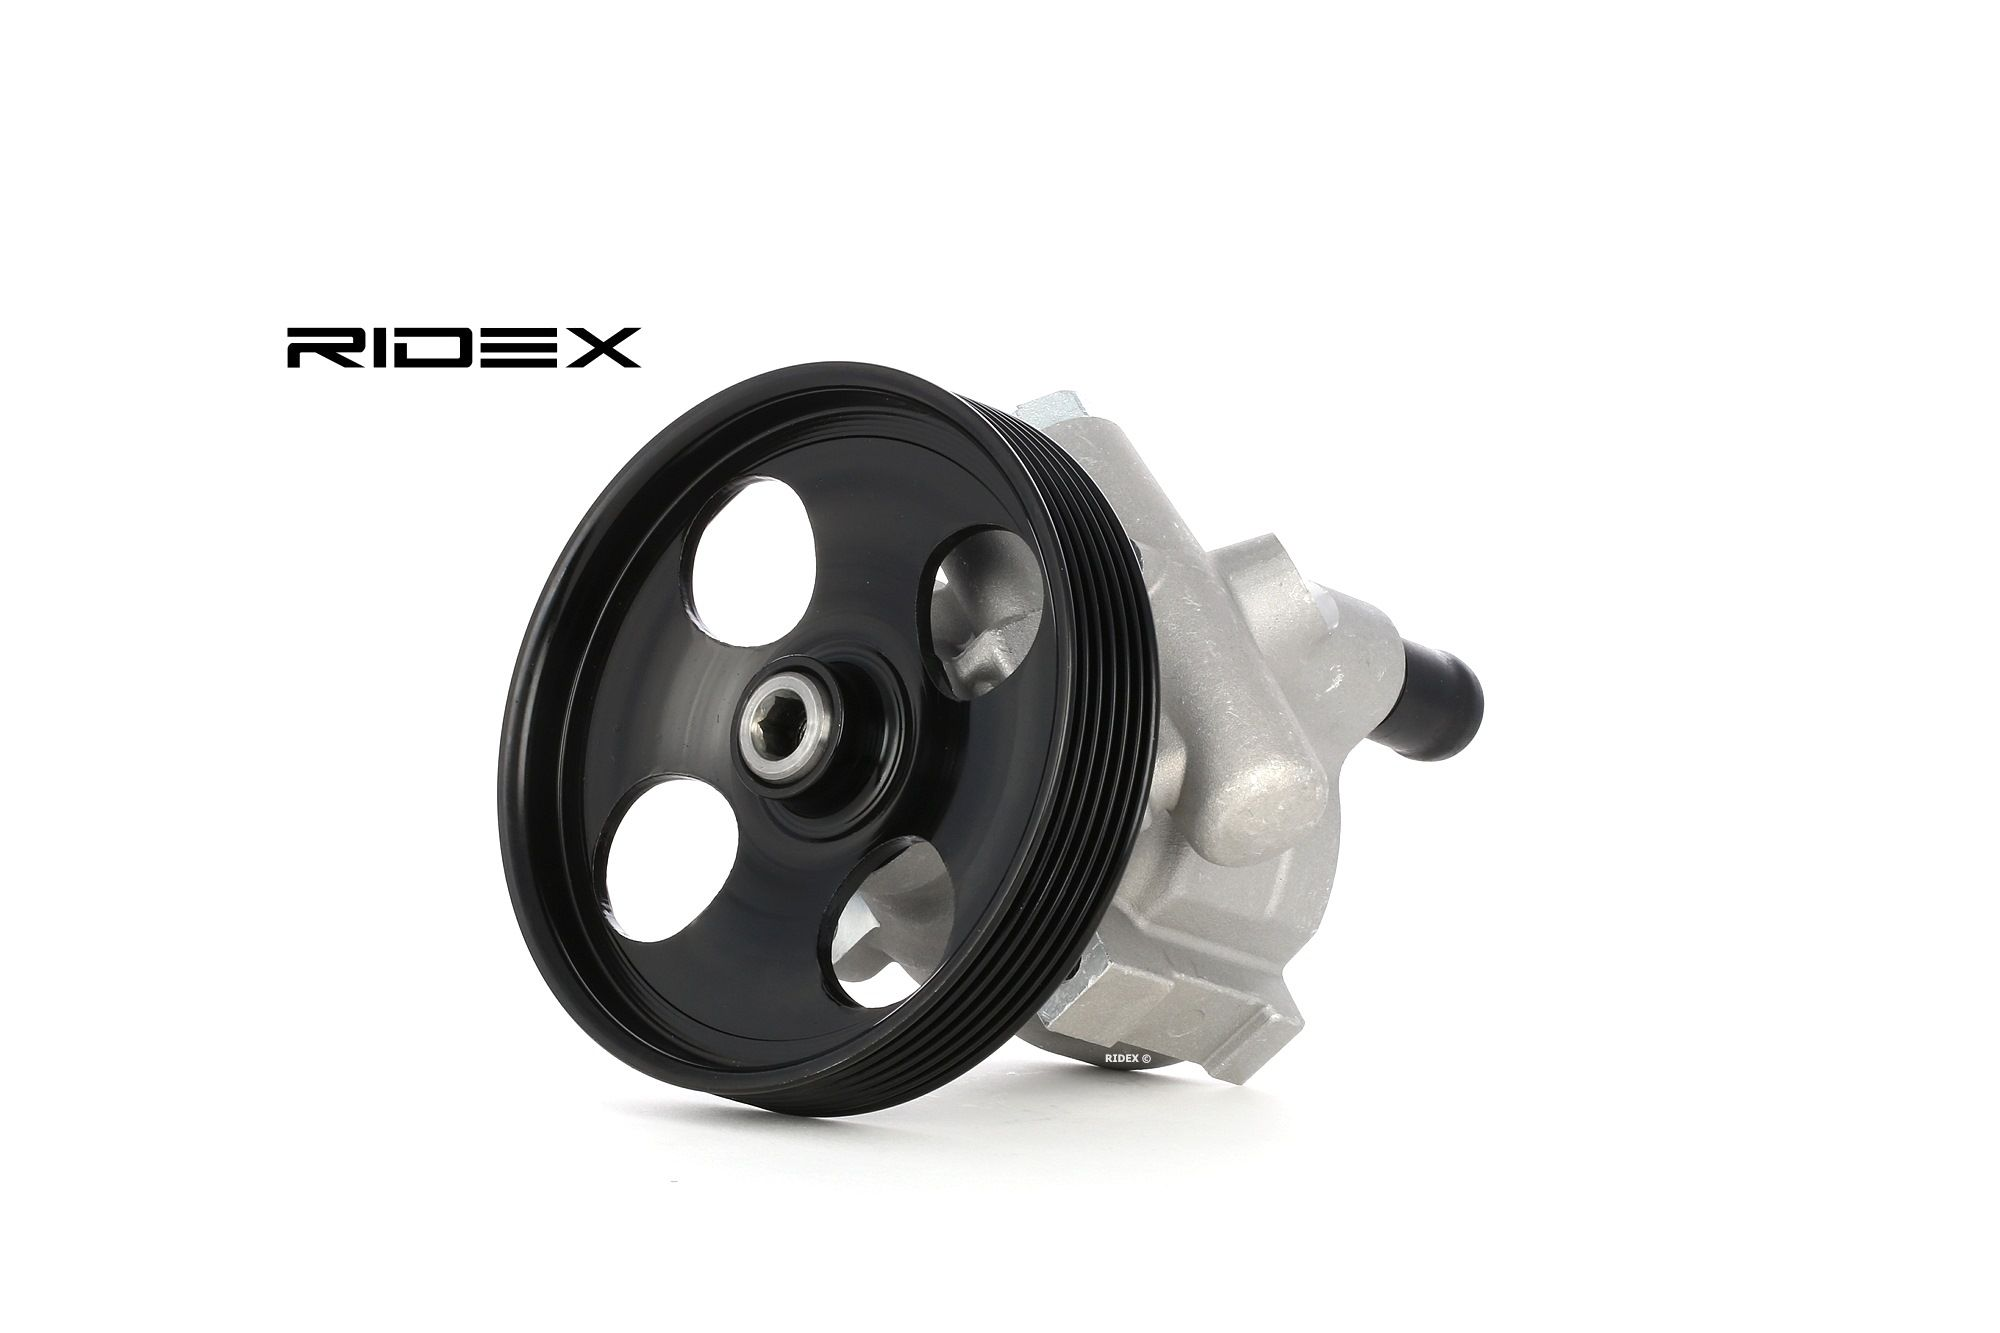 RIDEX: Original Servolenkung Pumpe 12H0006 (Links-/Rechtslenker: für Links-/Rechtslenker)